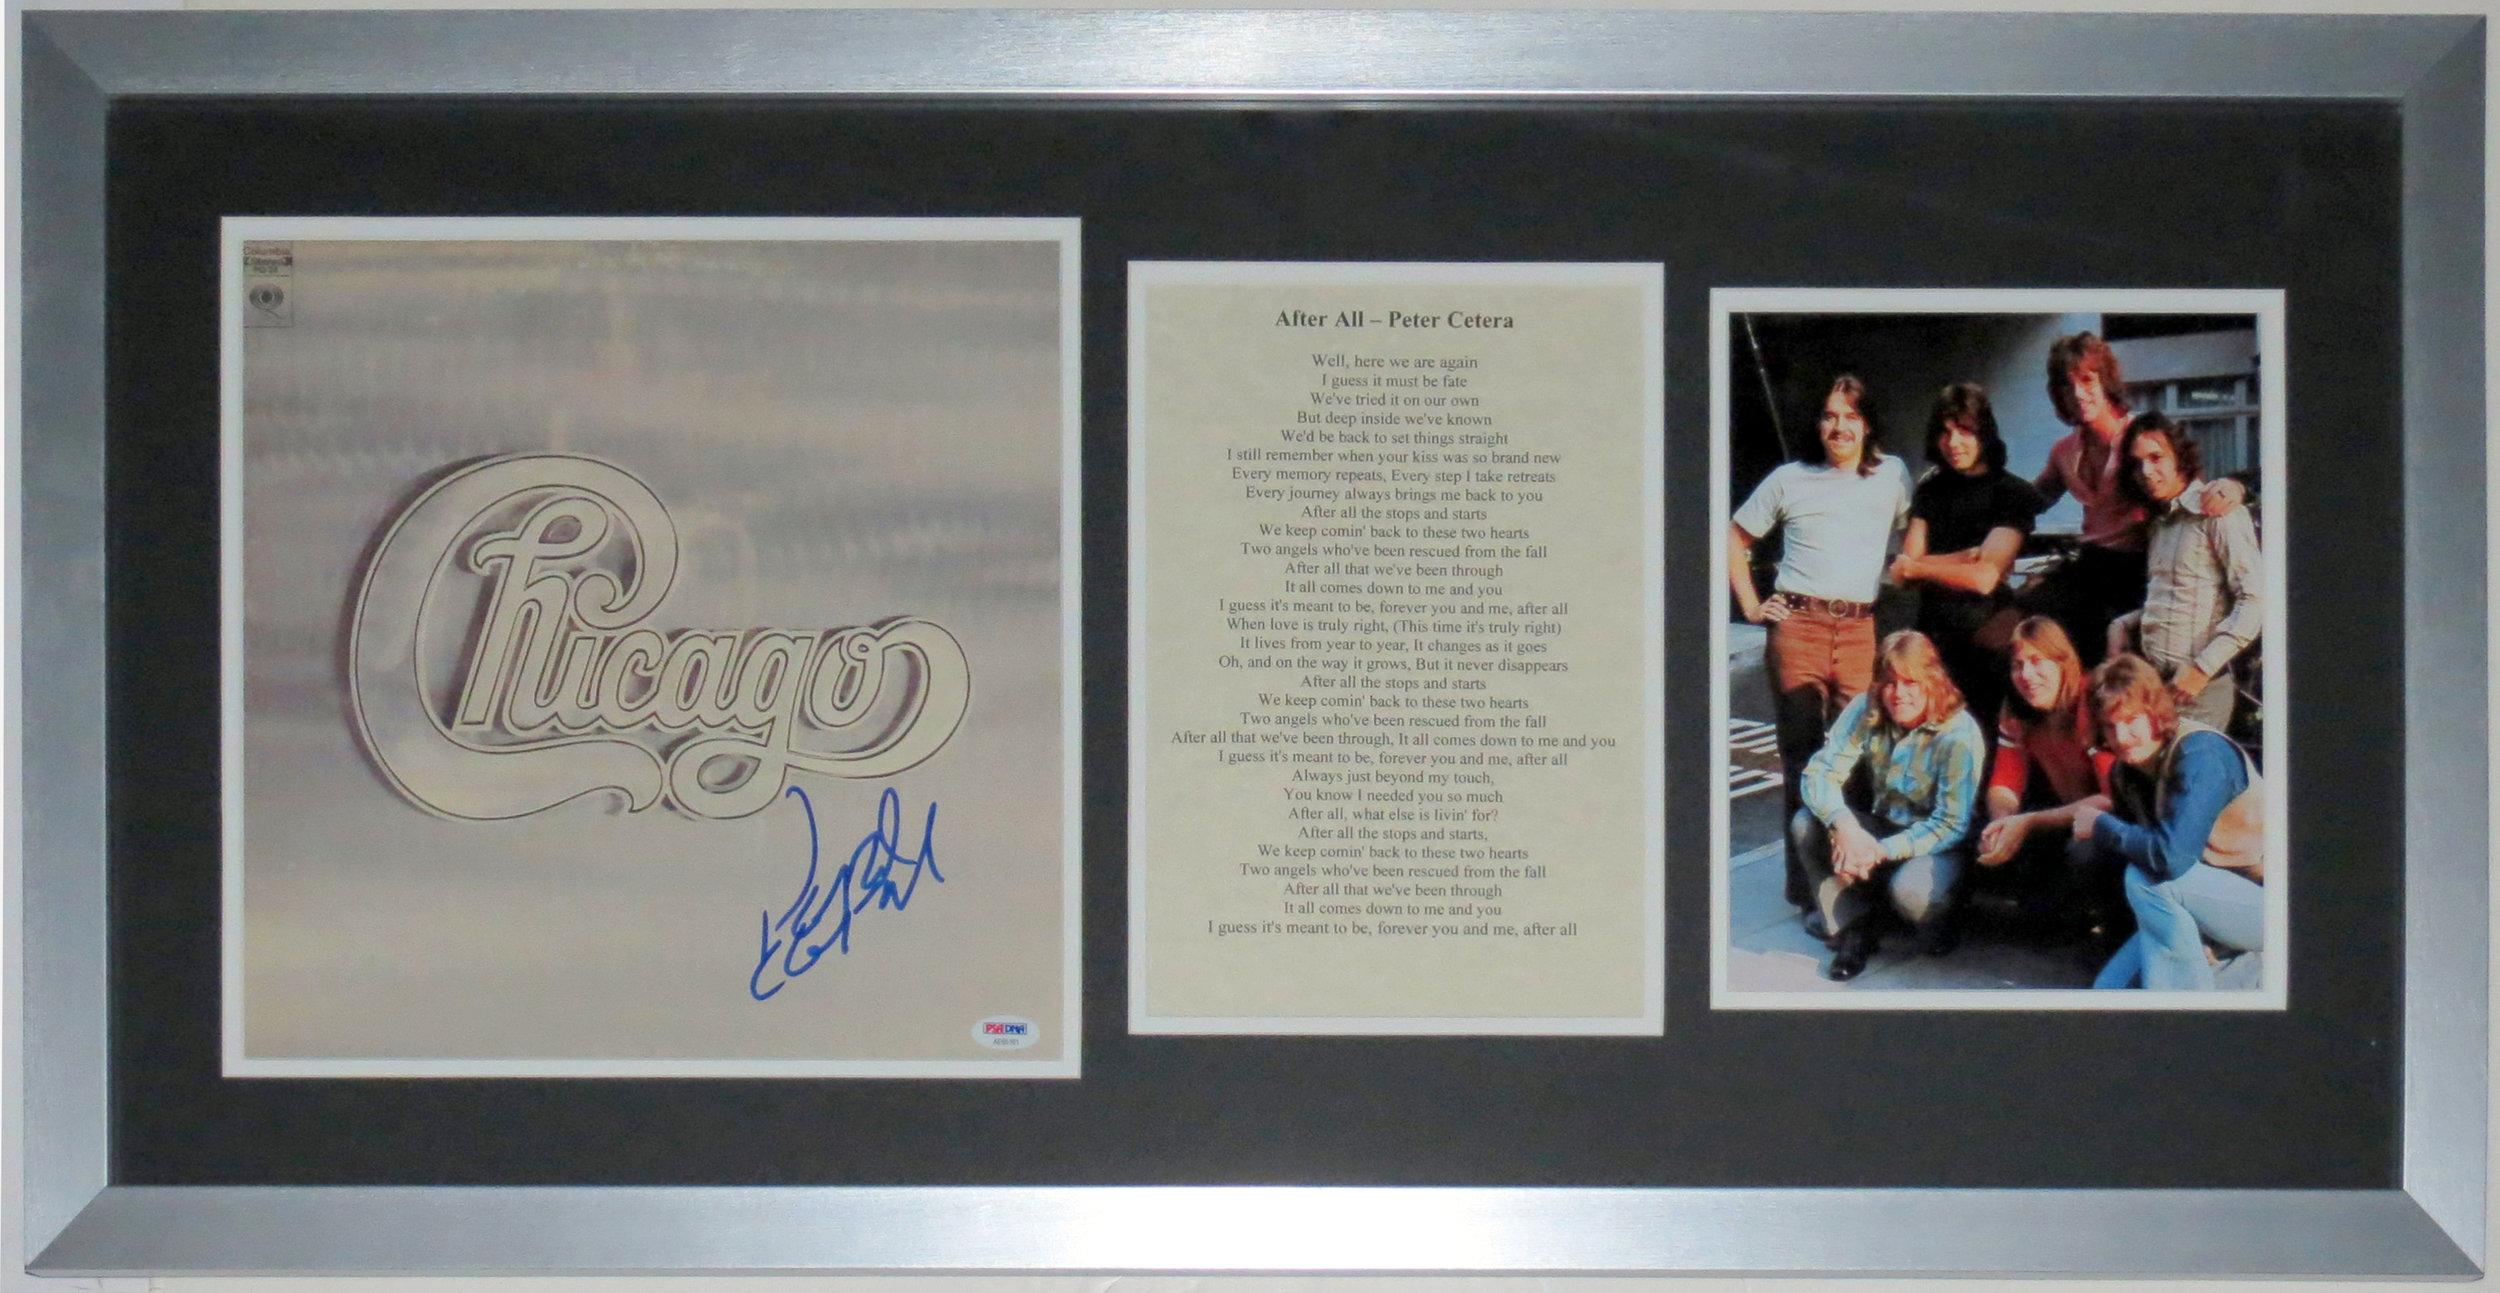 Peter Cetera Signed Chicago Album - PSA DNA COA Authenticated - Professionally Framed & Band 8x10 Photo & Lyrics 34x16